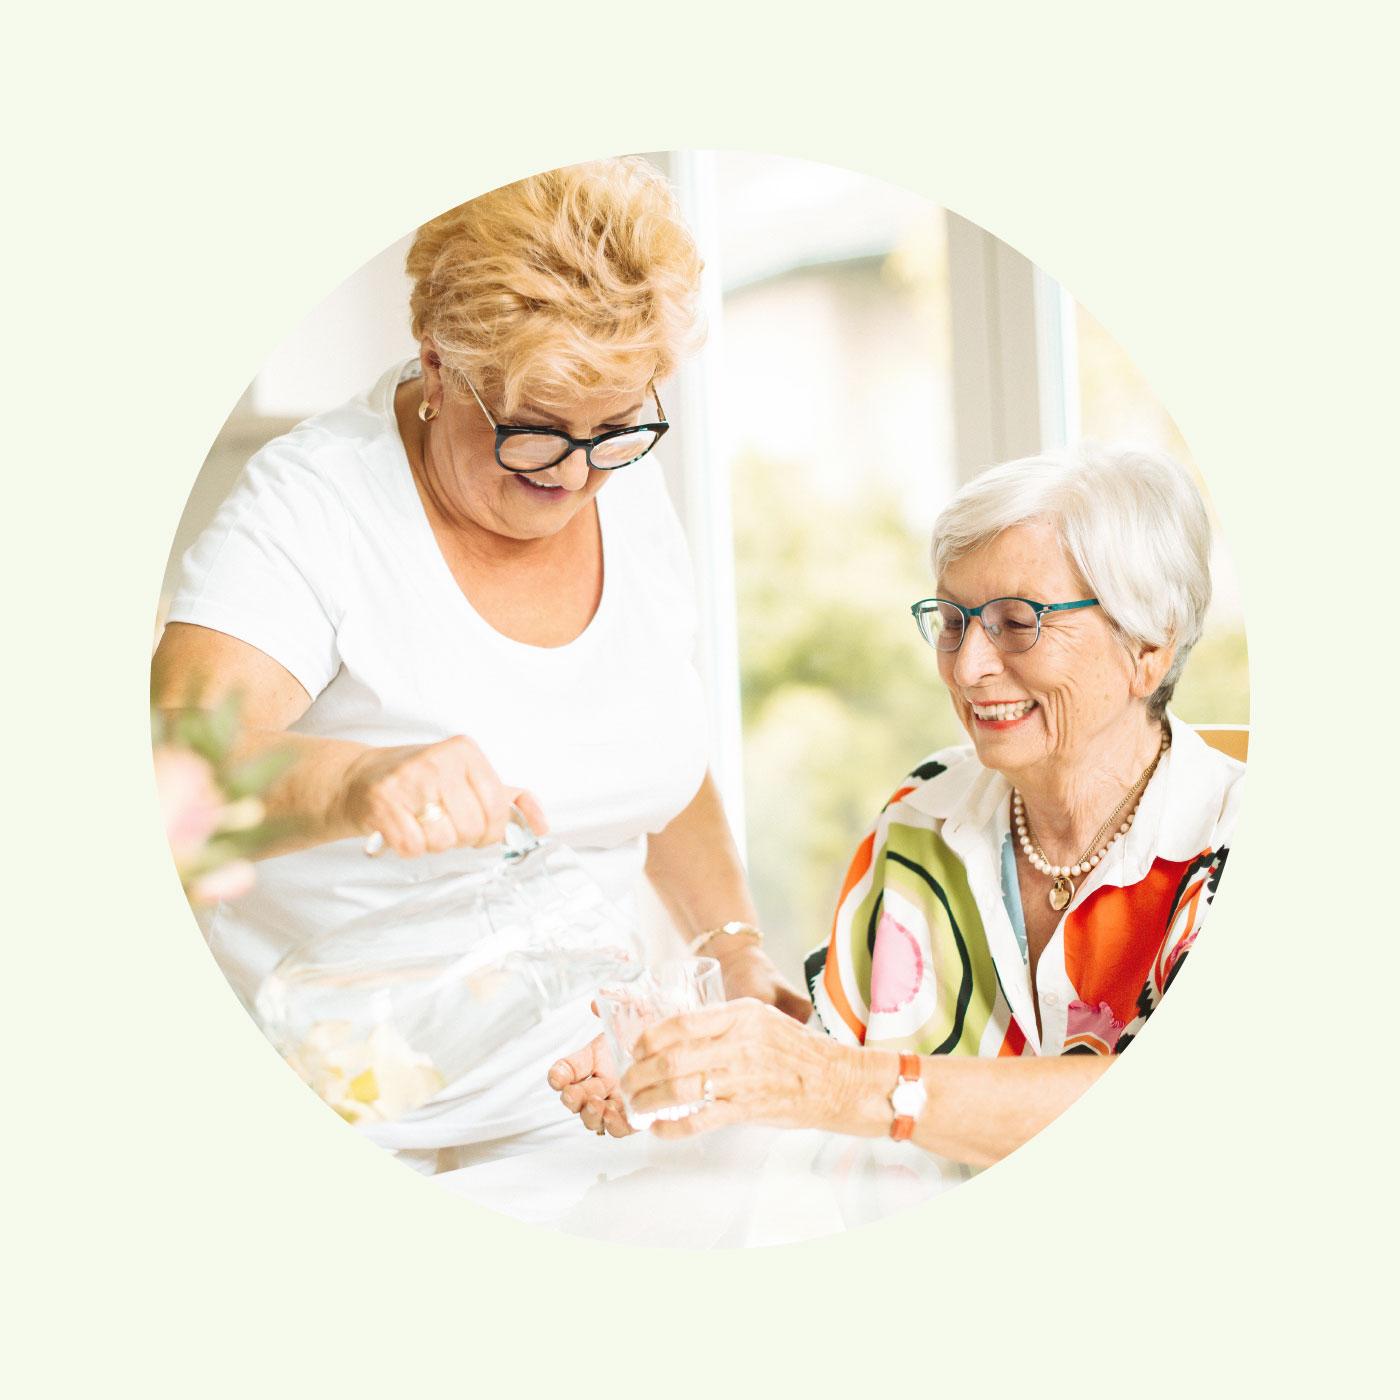 Seniorenbetreuung zu Hause